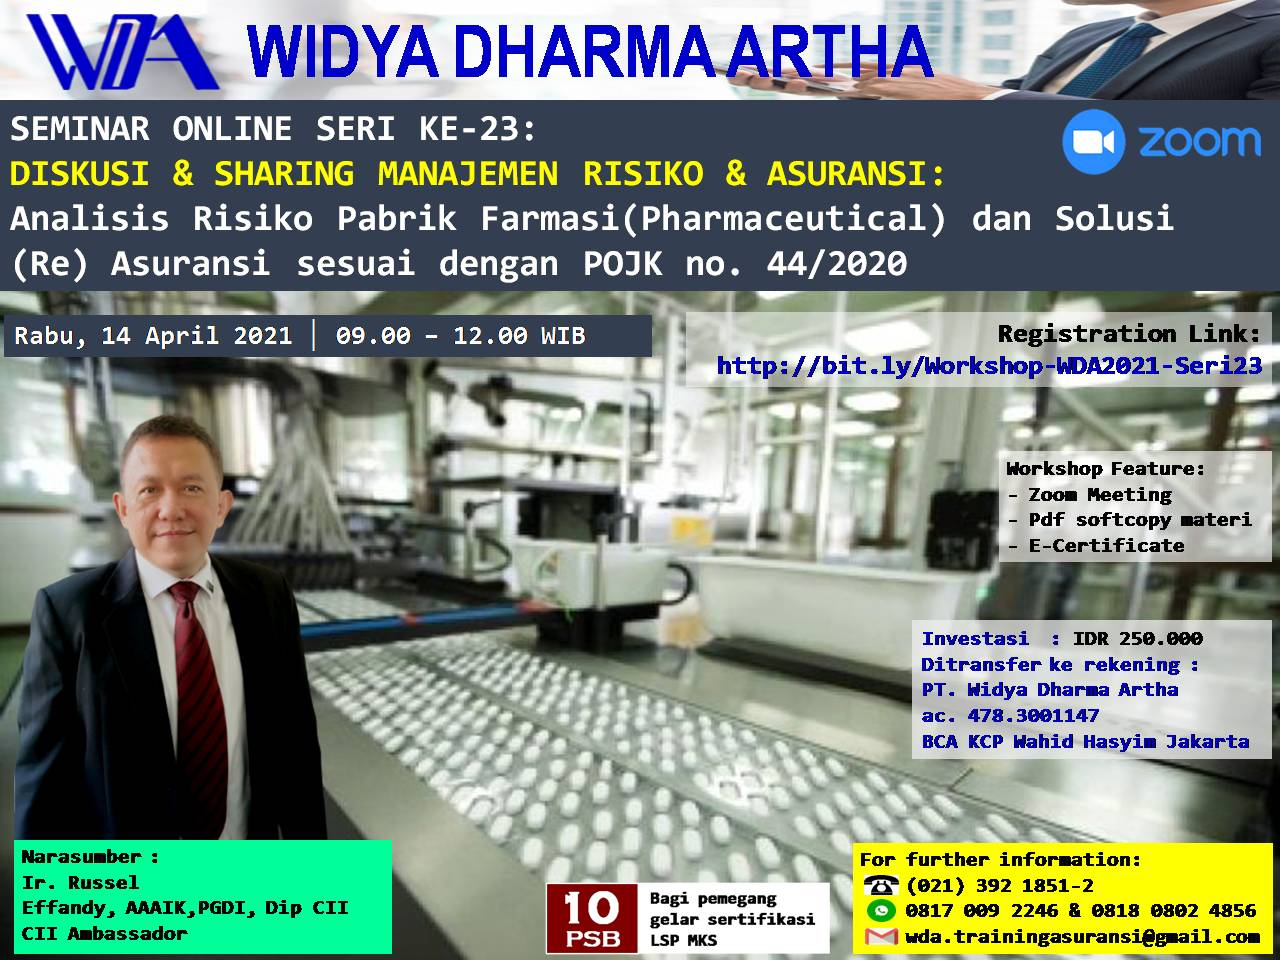 wda-pabrik-farmasi-140421